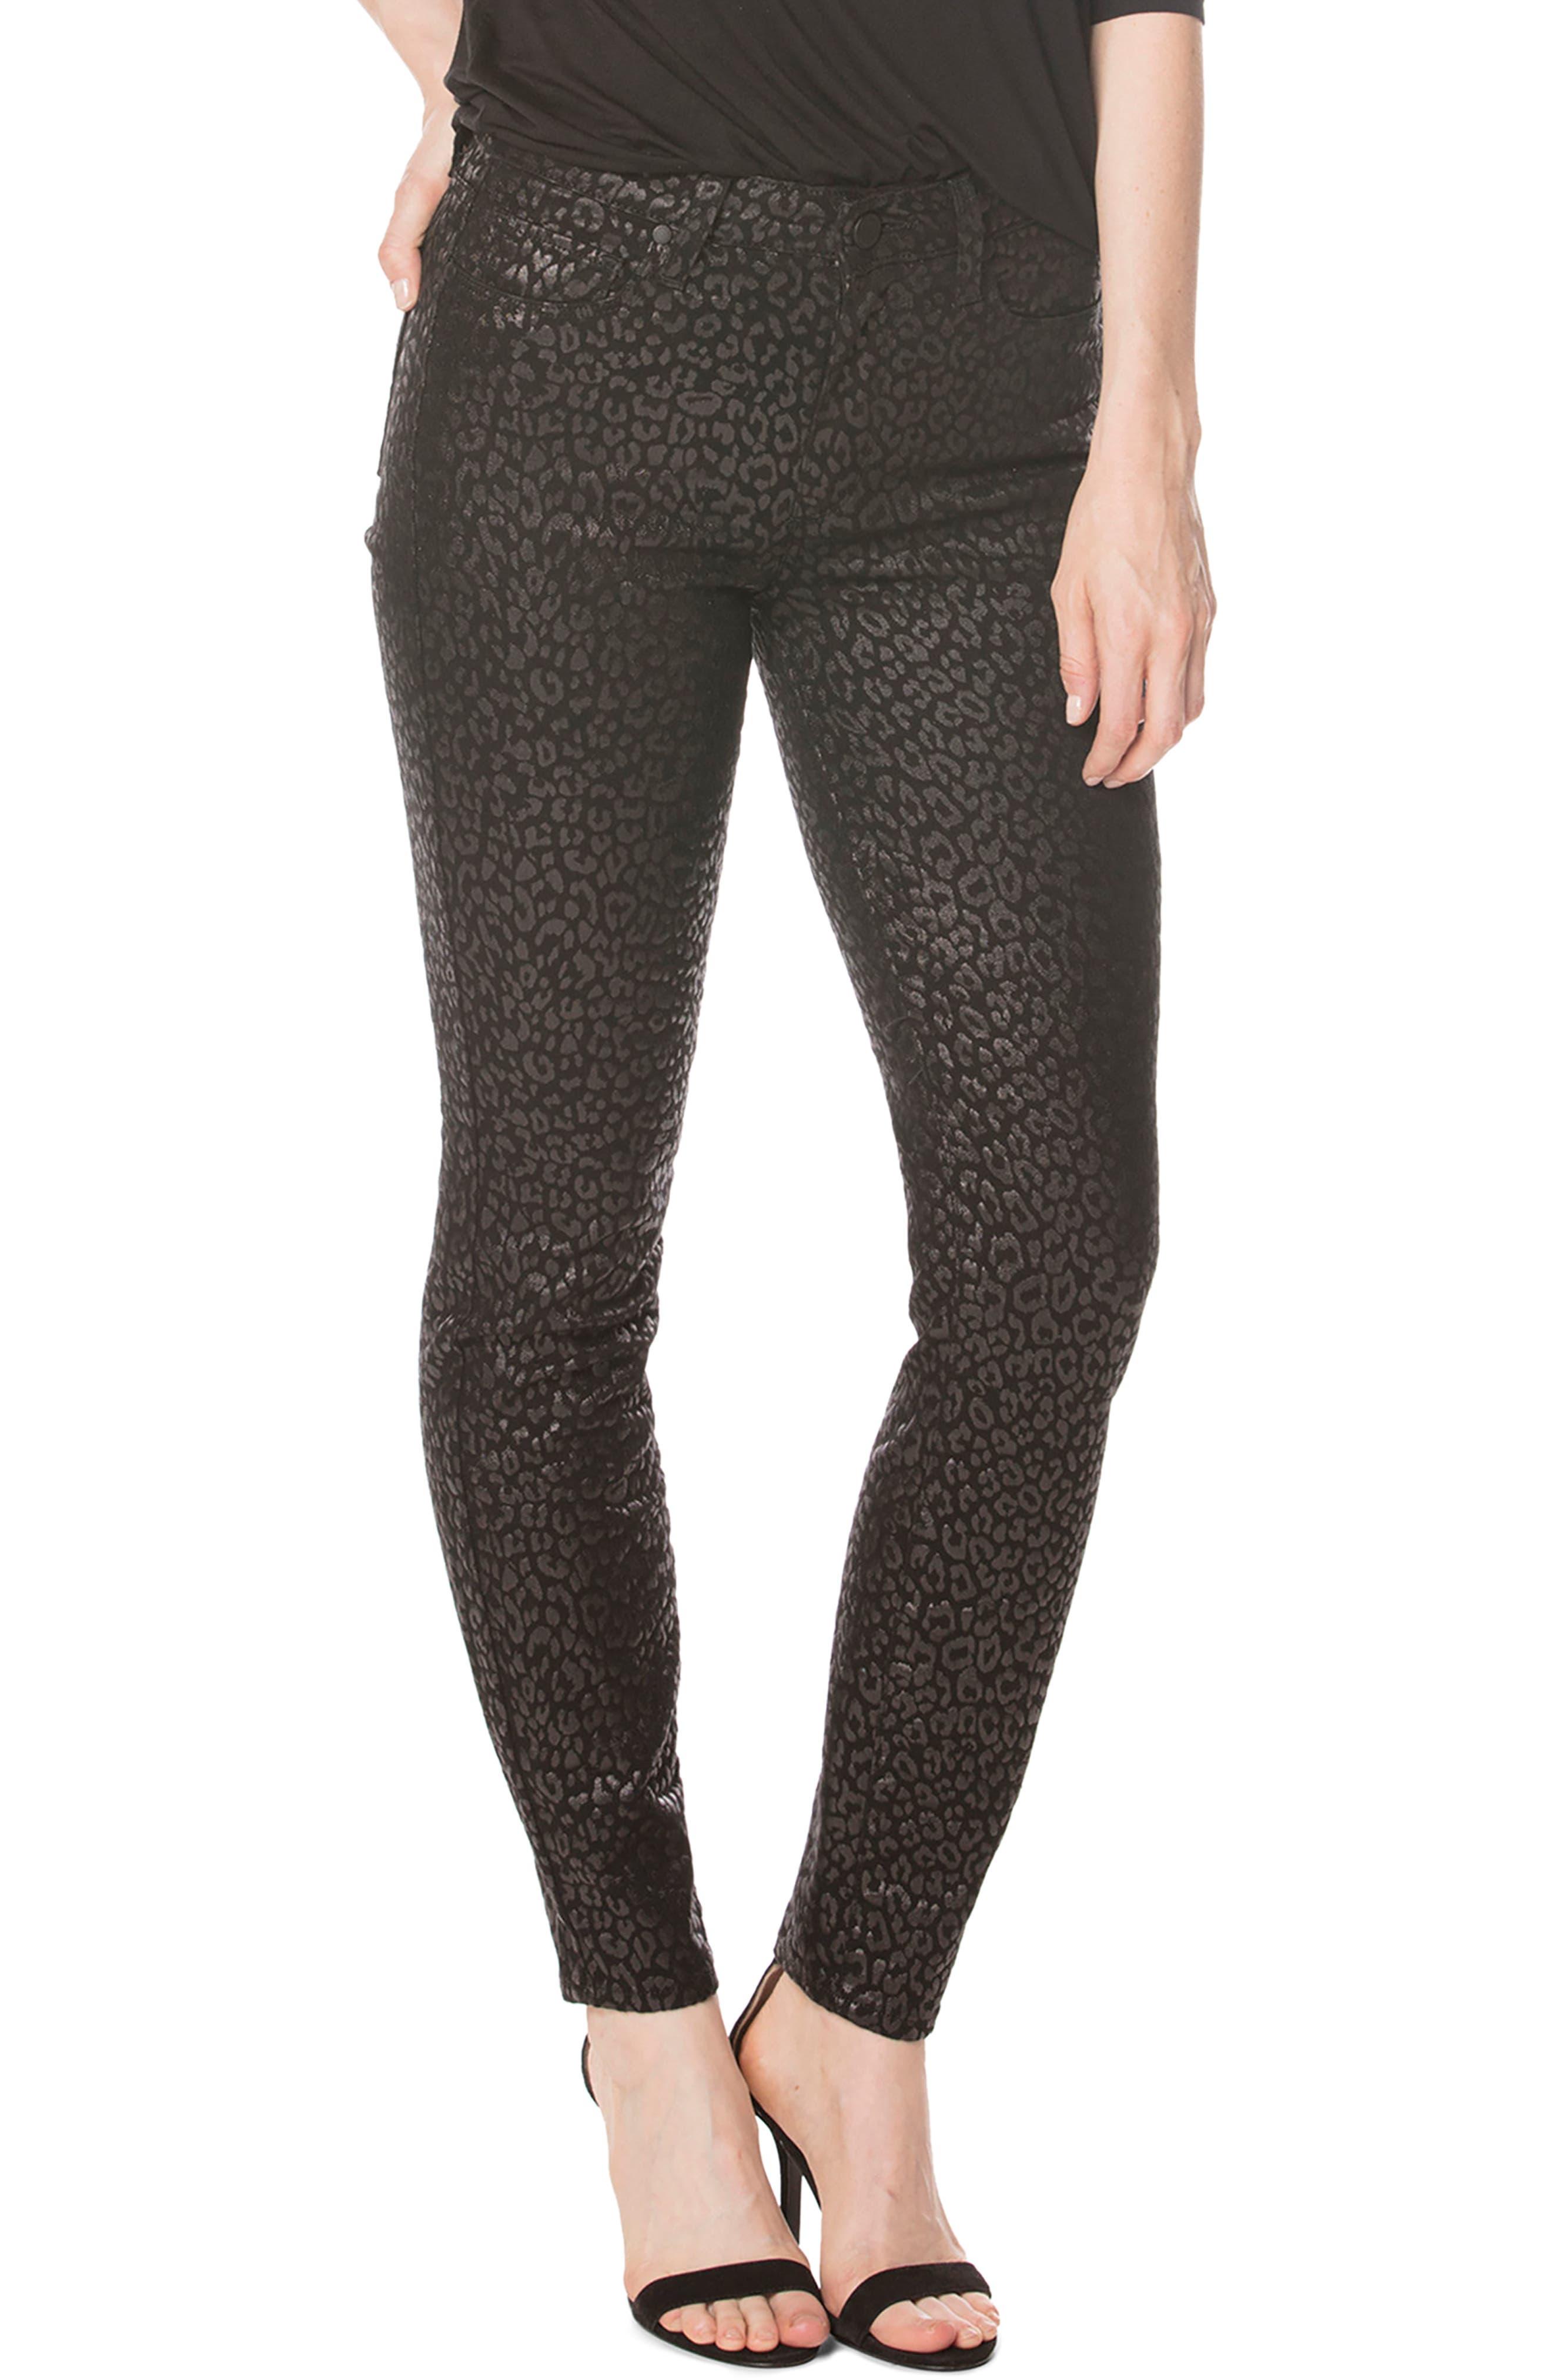 Hoxton High Waist Ultra Skinny Pants,                         Main,                         color, 001